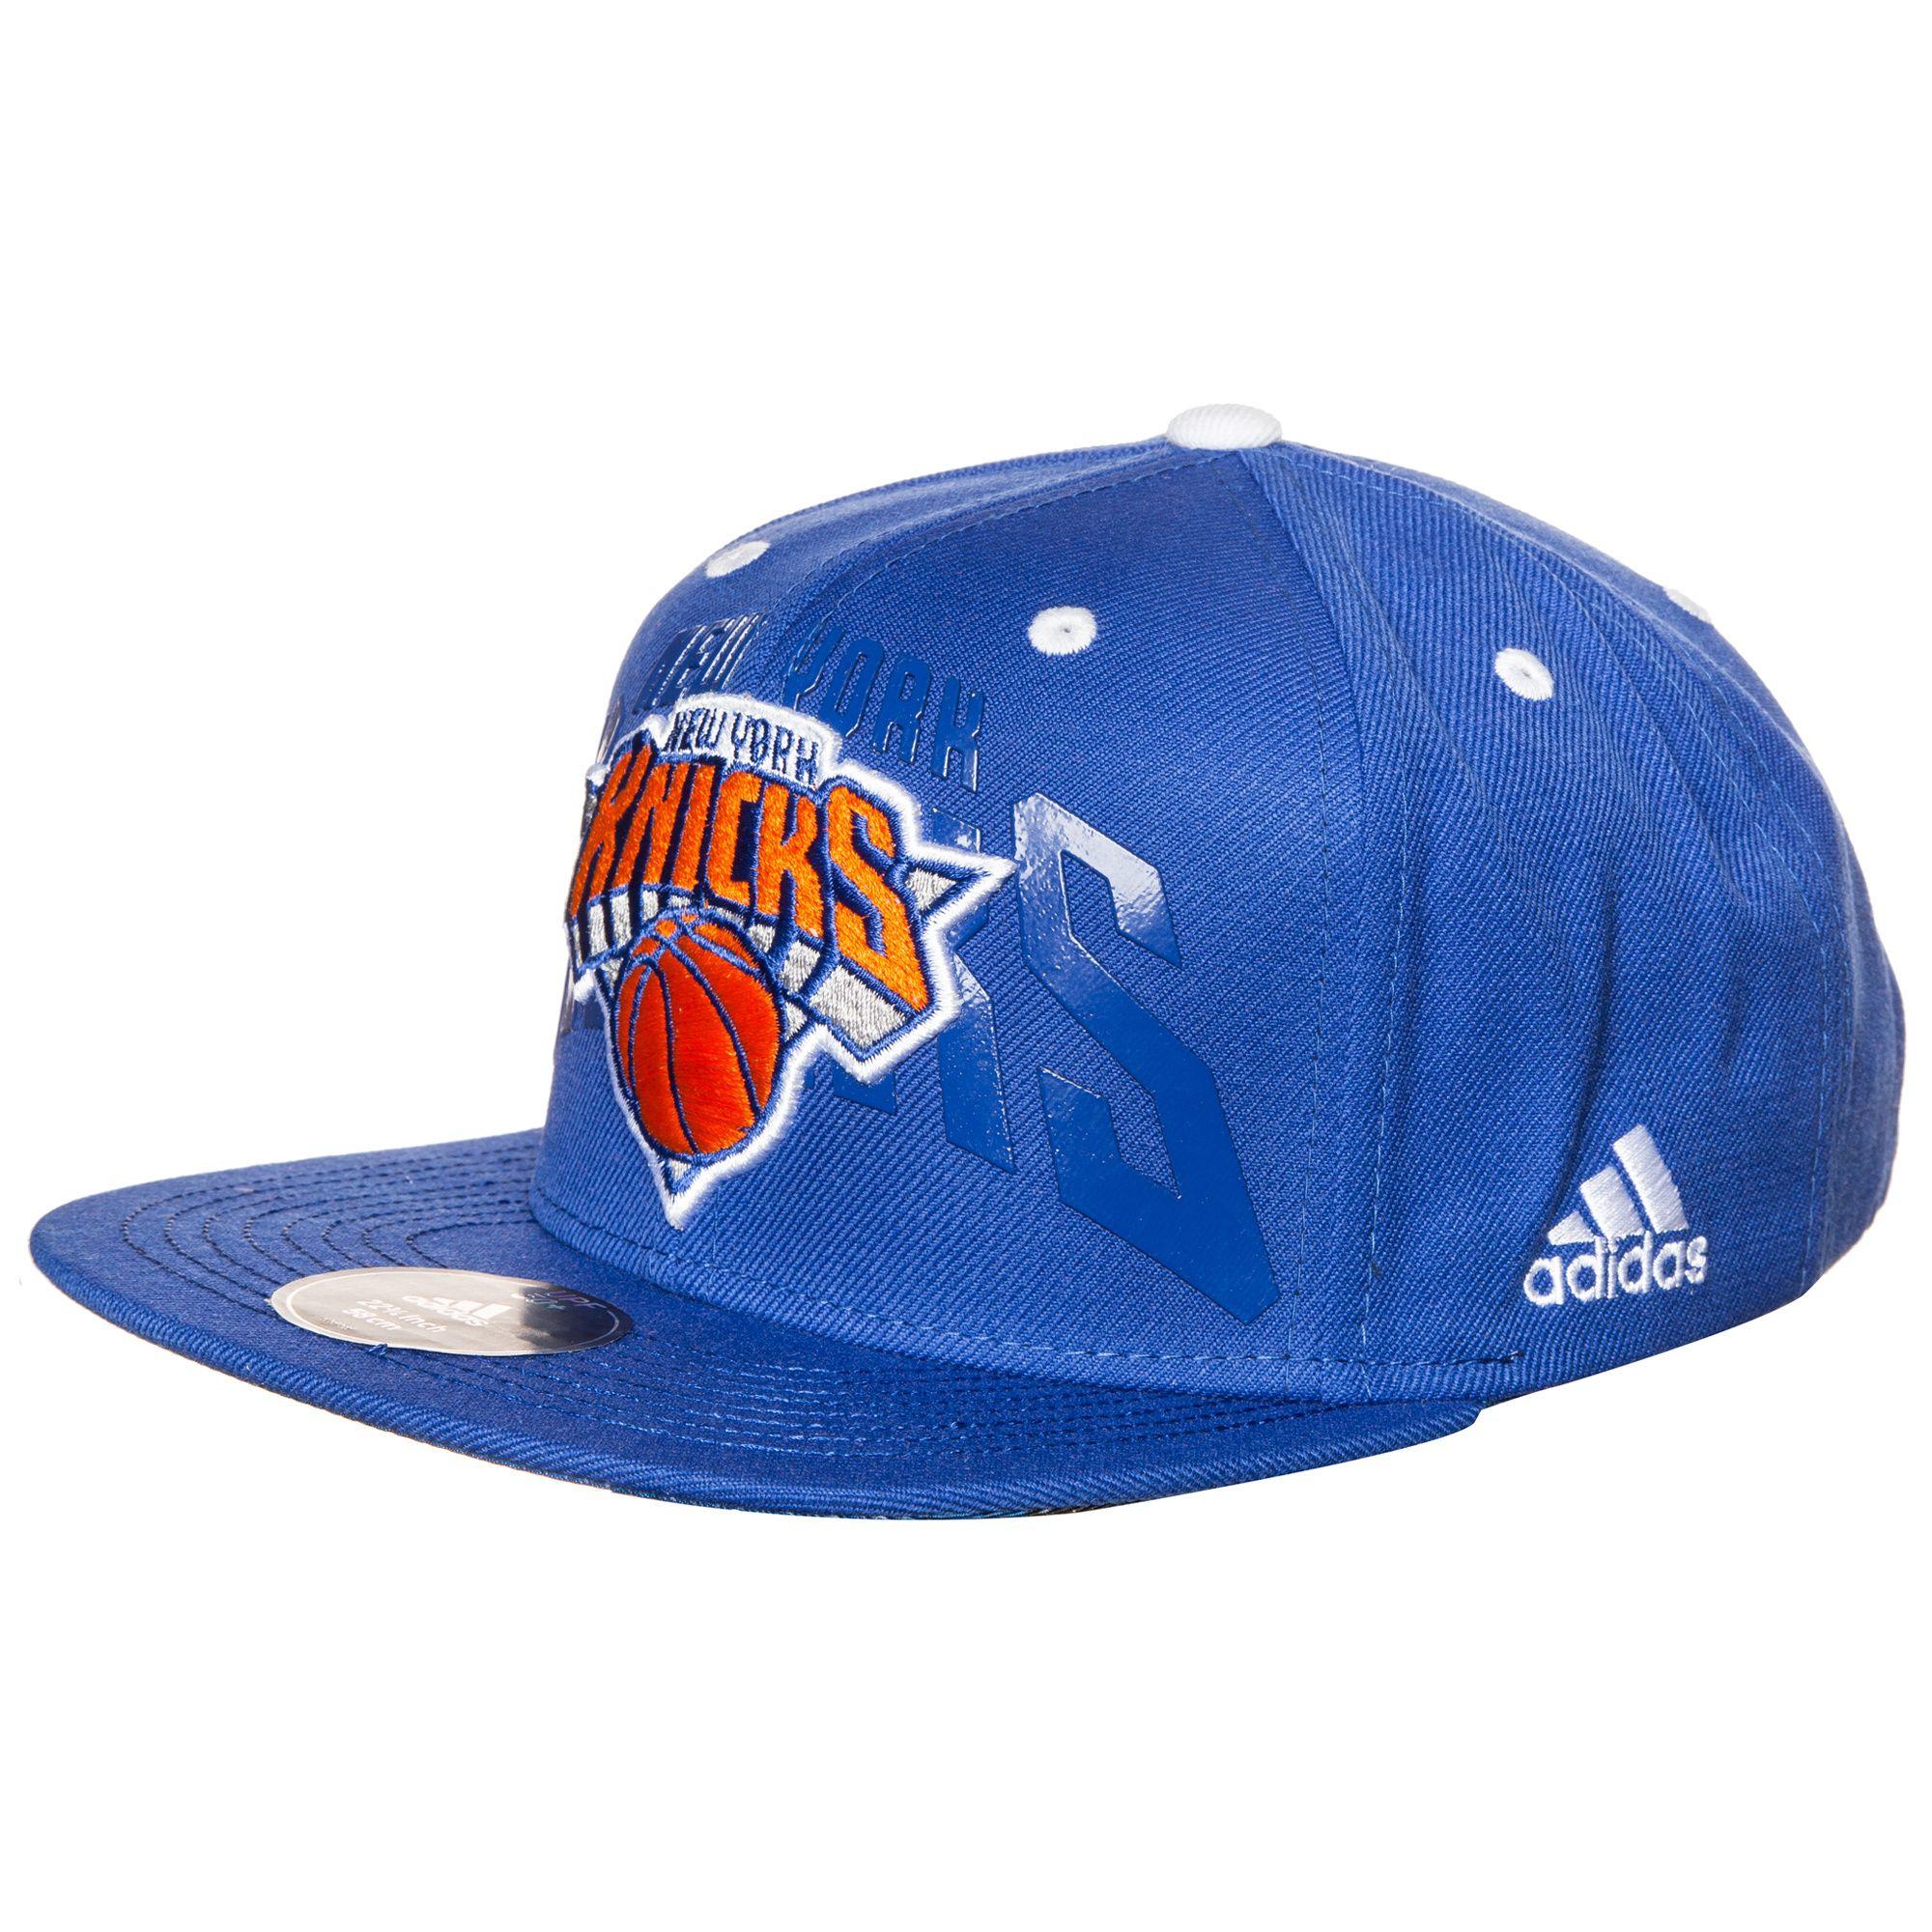 ADIDAS PERFORMANCE adidas Performance New York Knicks Anthem Cap Herren